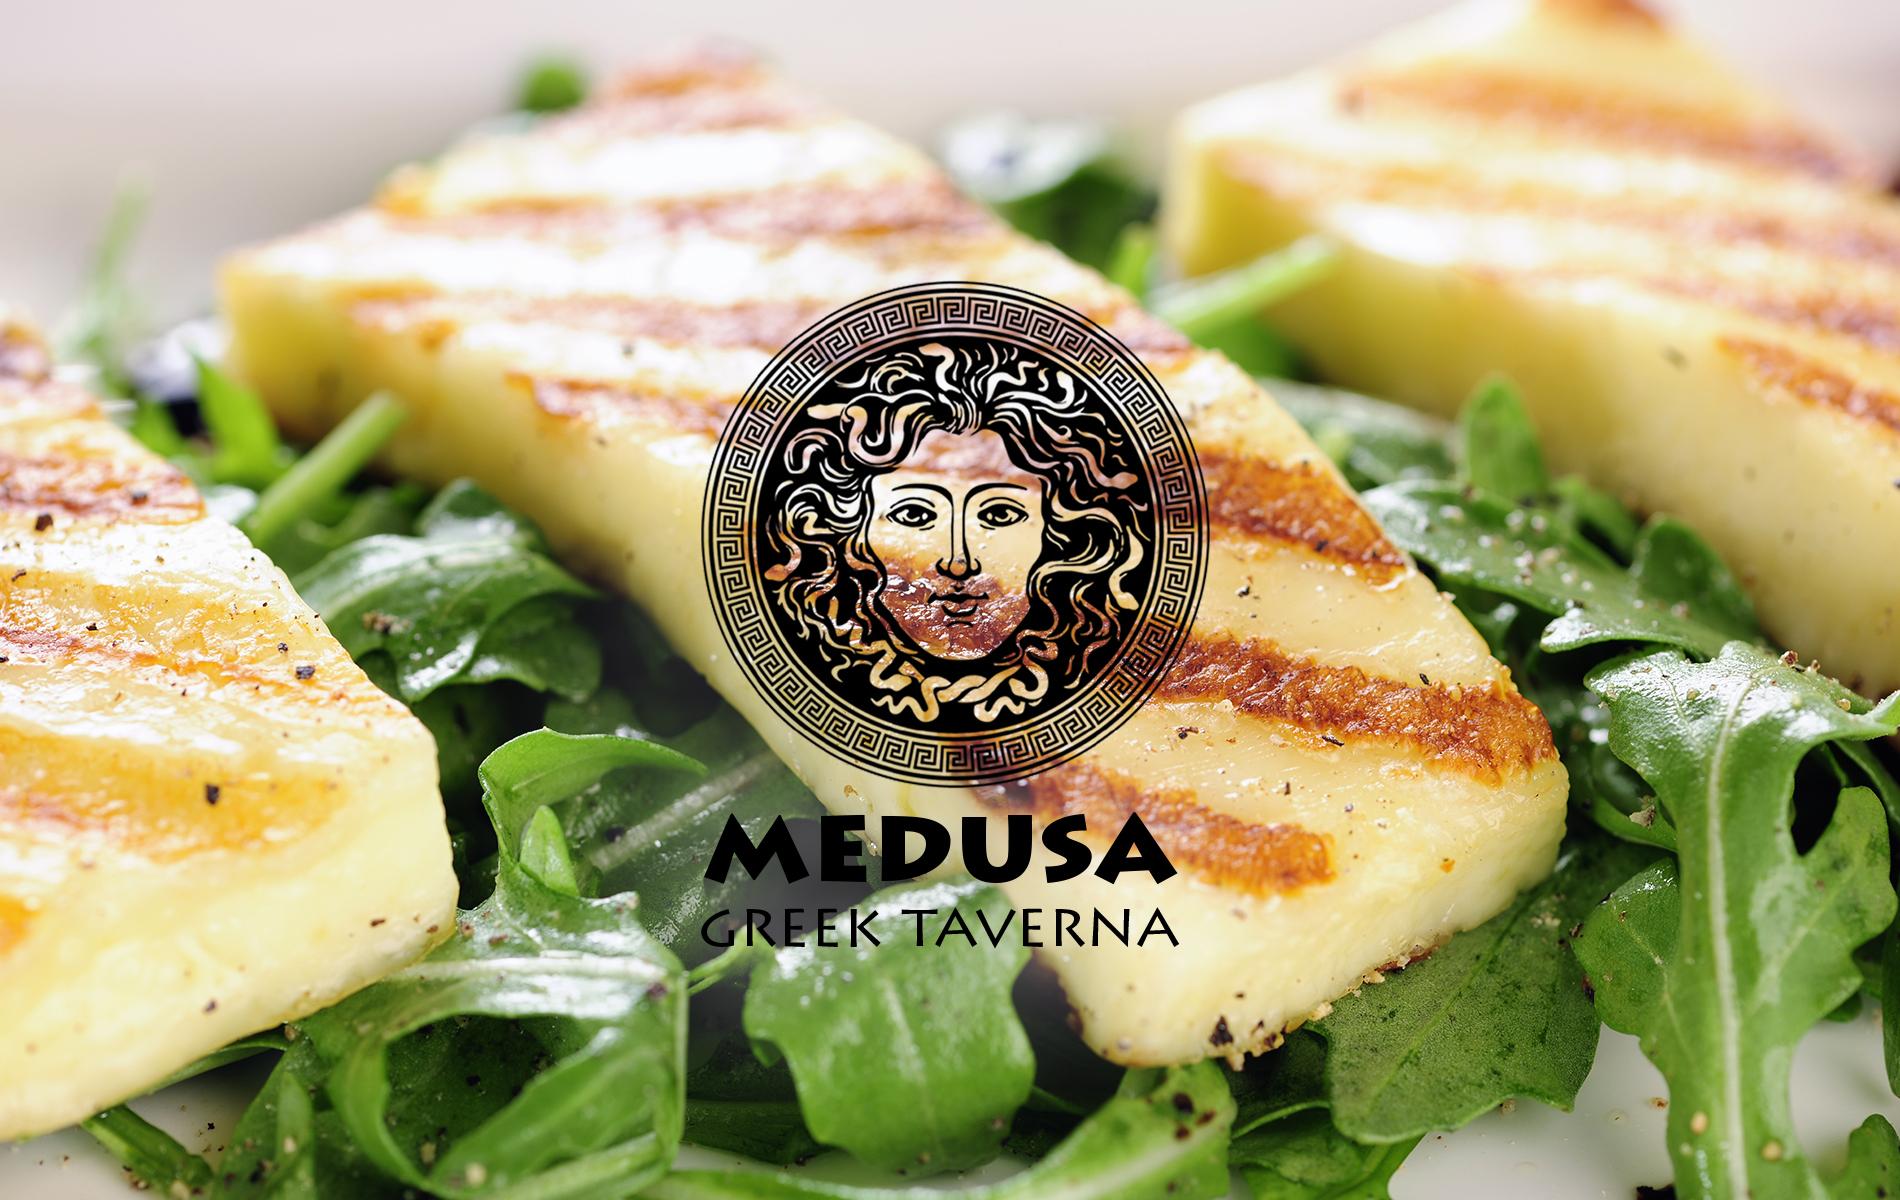 1900x1200 medusa carousel vr1a - Pre Show Dining